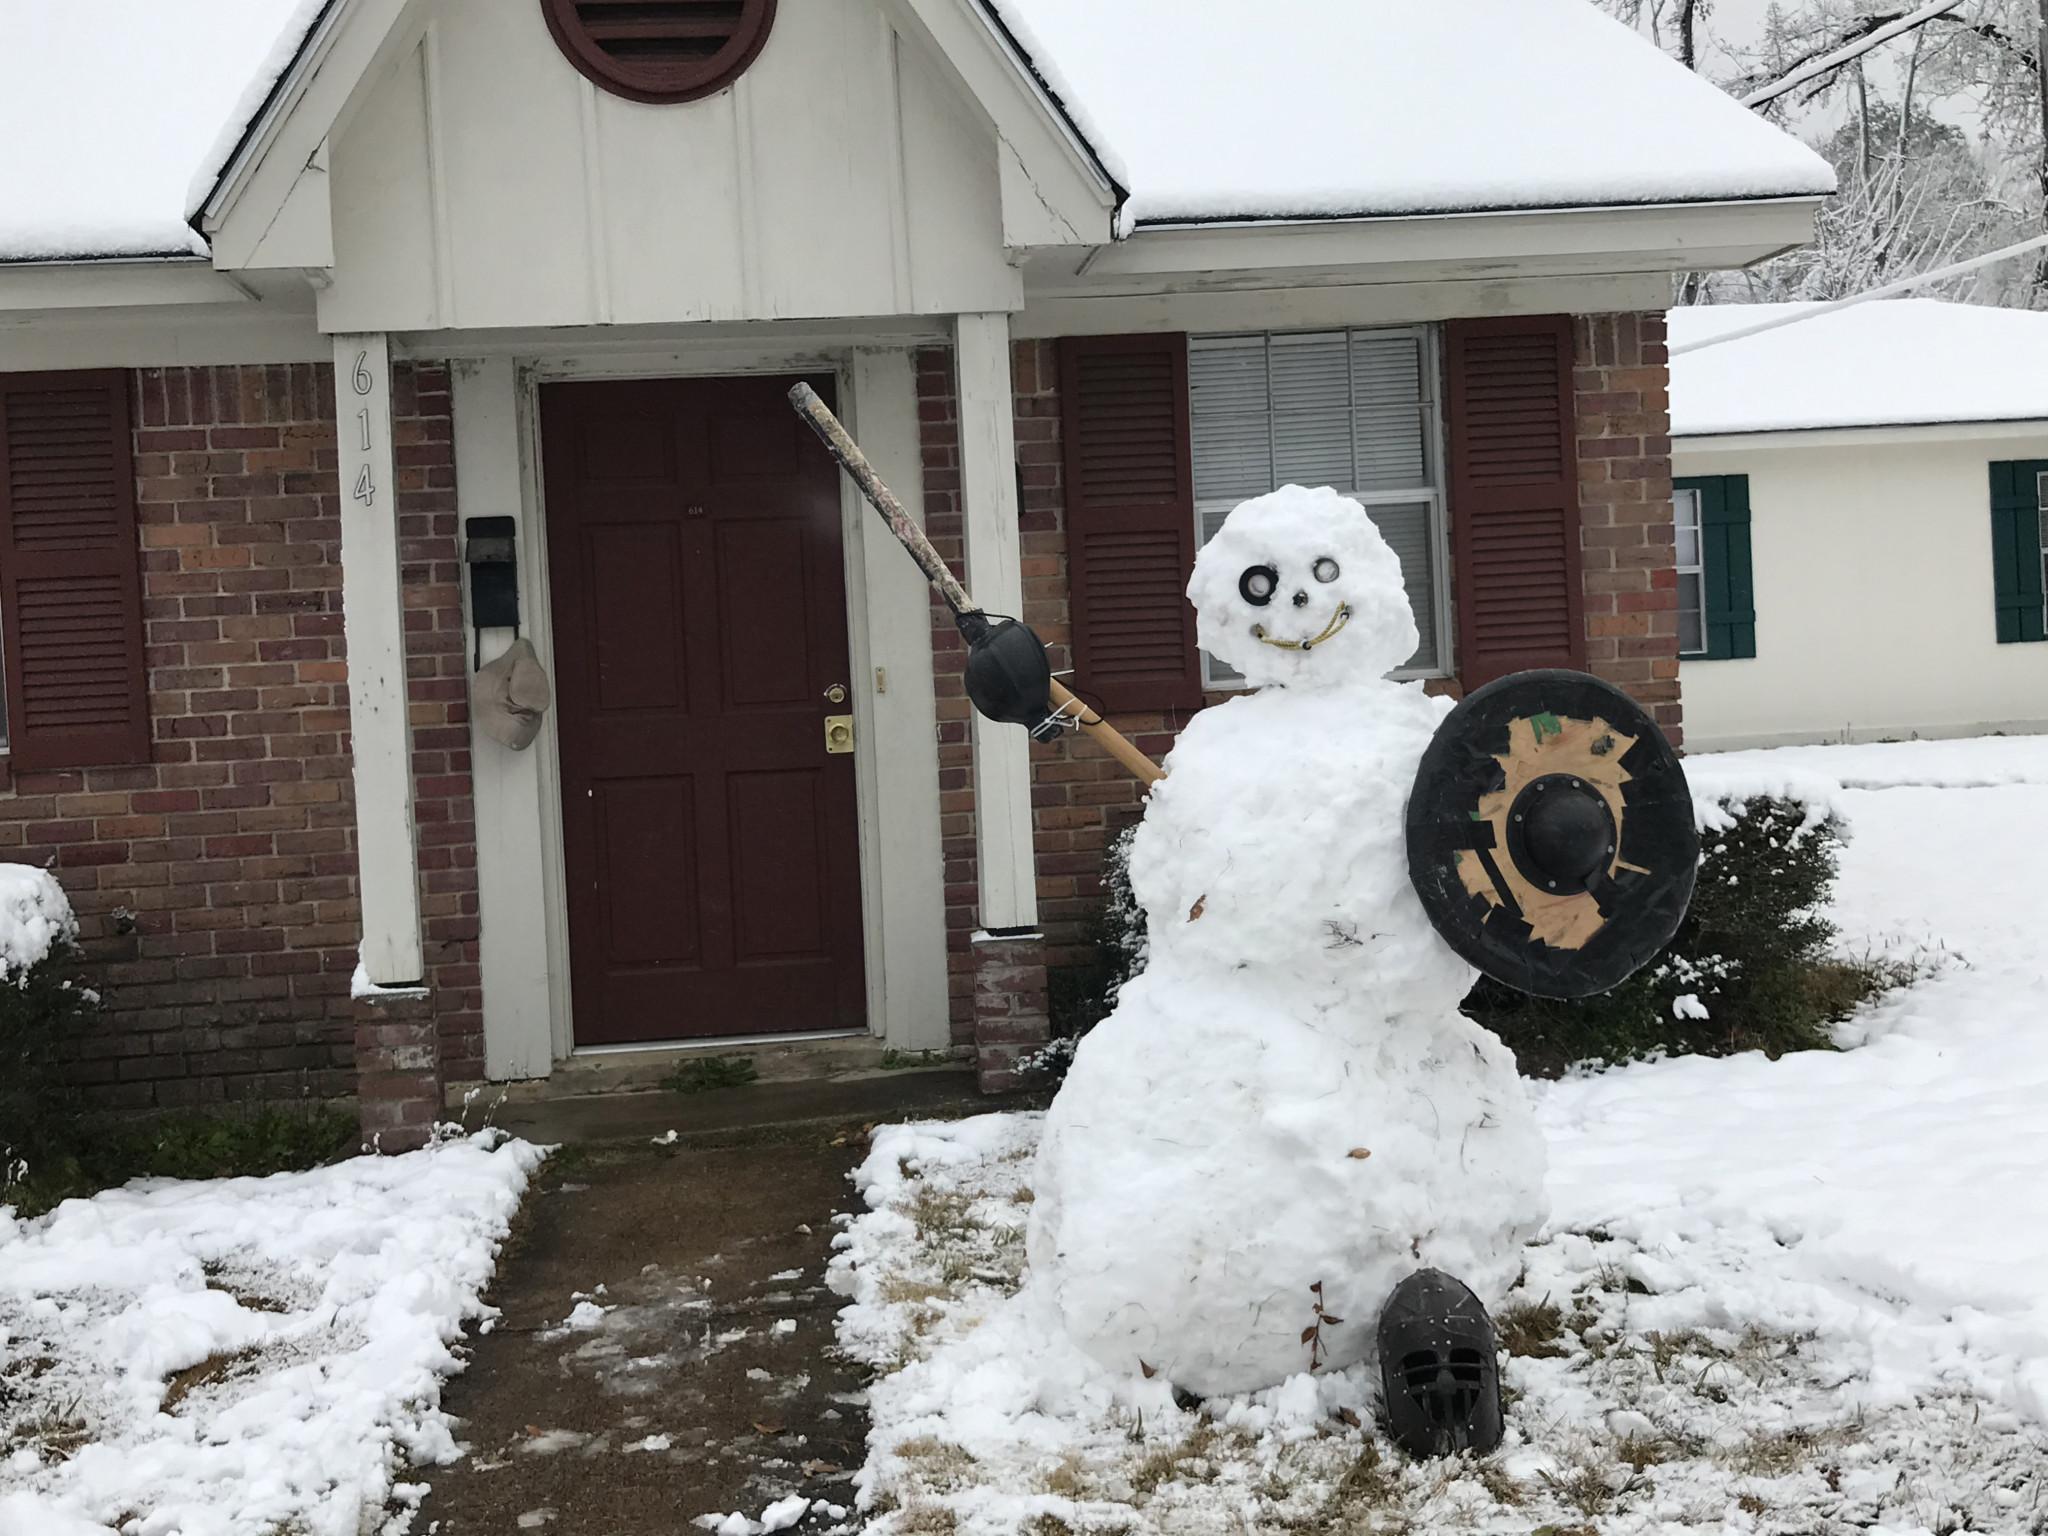 A warrior snowman builty by Hugh Oliver - Leader photo by Caleb Daniel